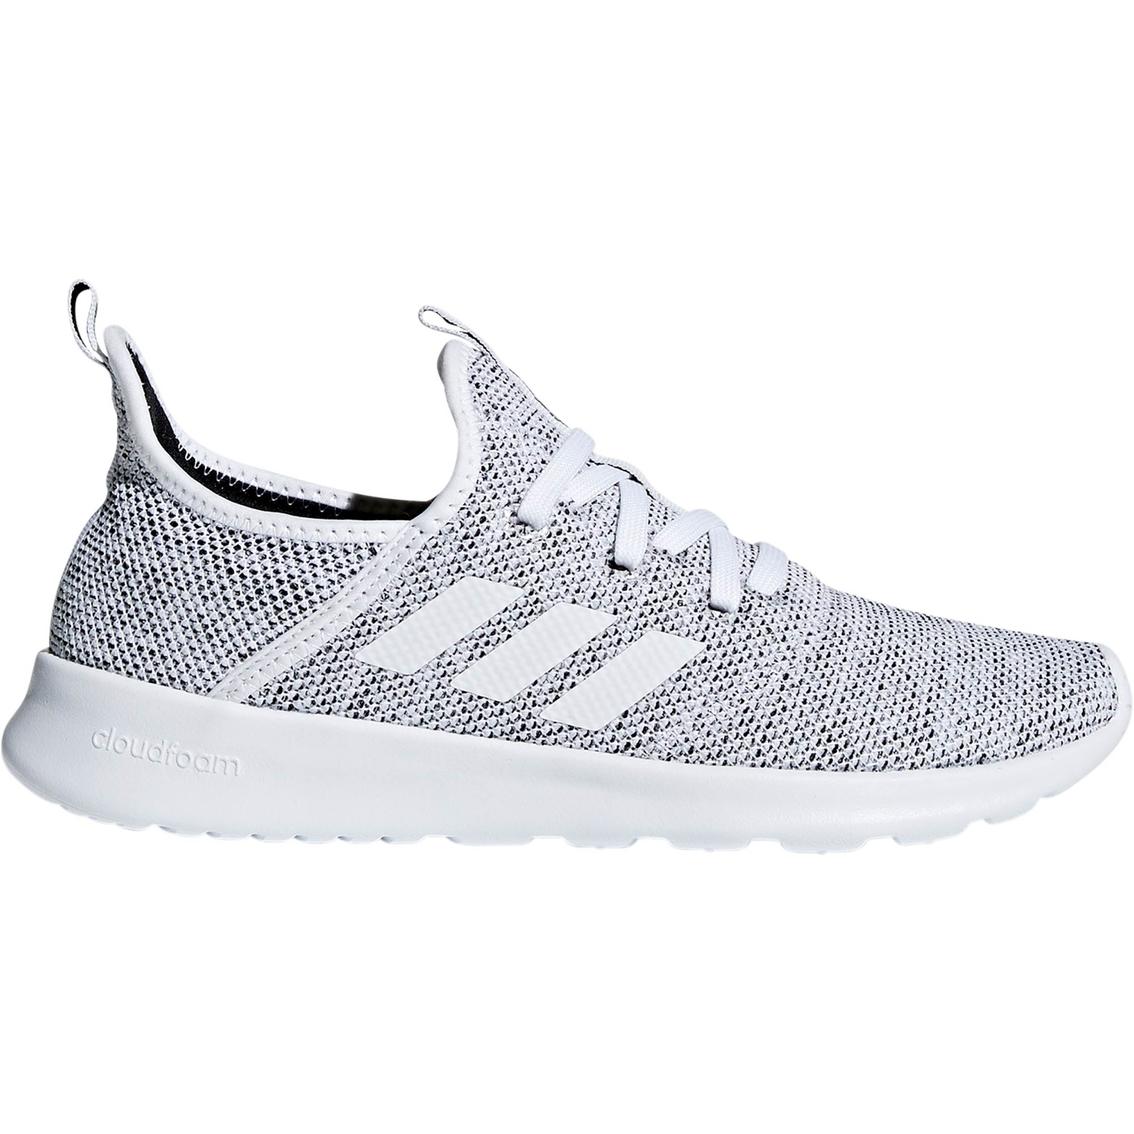 05ec2f6b402f Adidas Women s Cloudfoam Pure Athletic Shoes